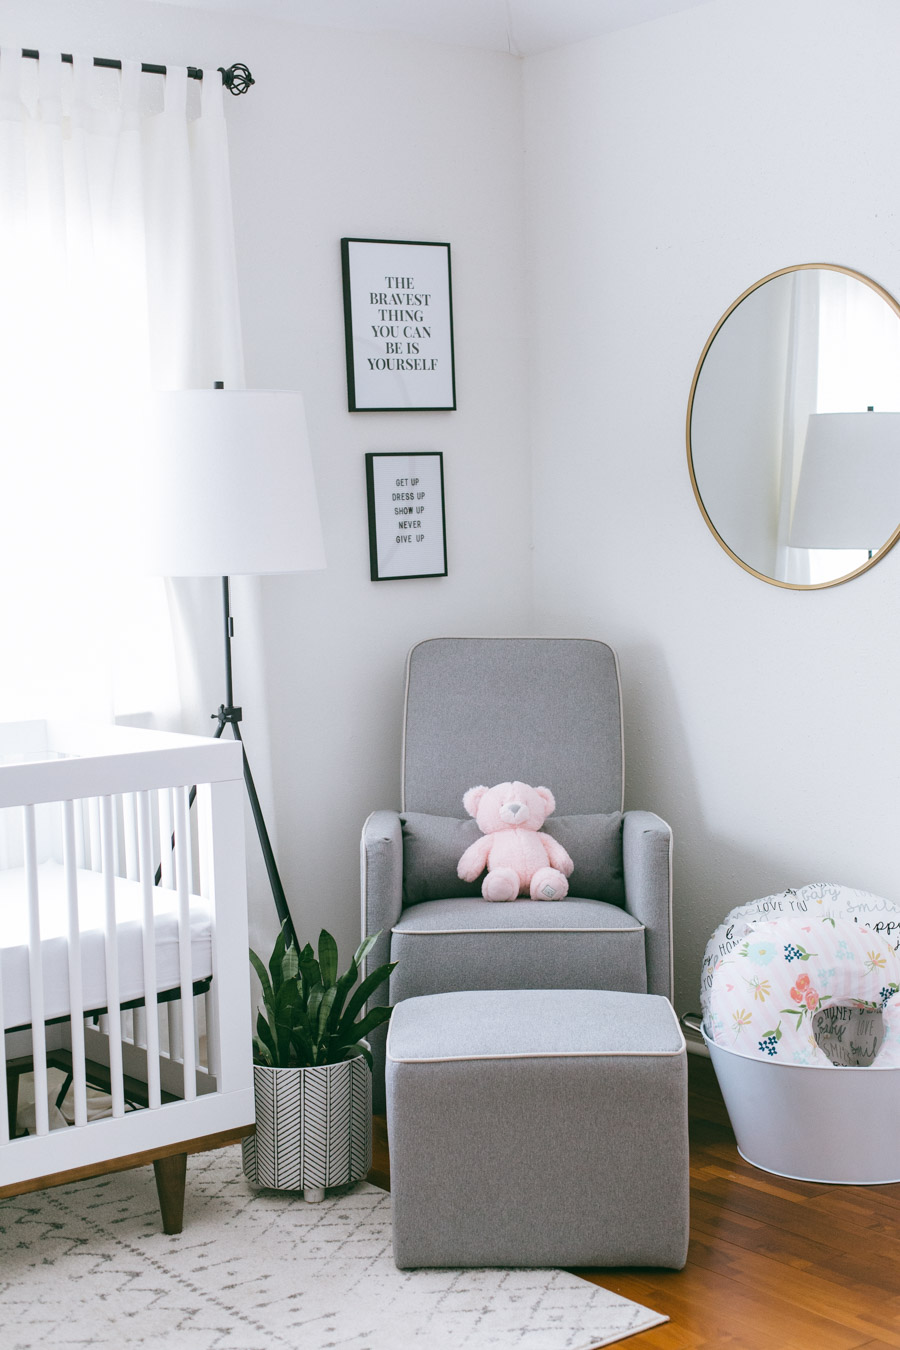 Black & White Baby Girl Nursery Ideas | Daily Craving Blog | Houston Lifestyle Blog